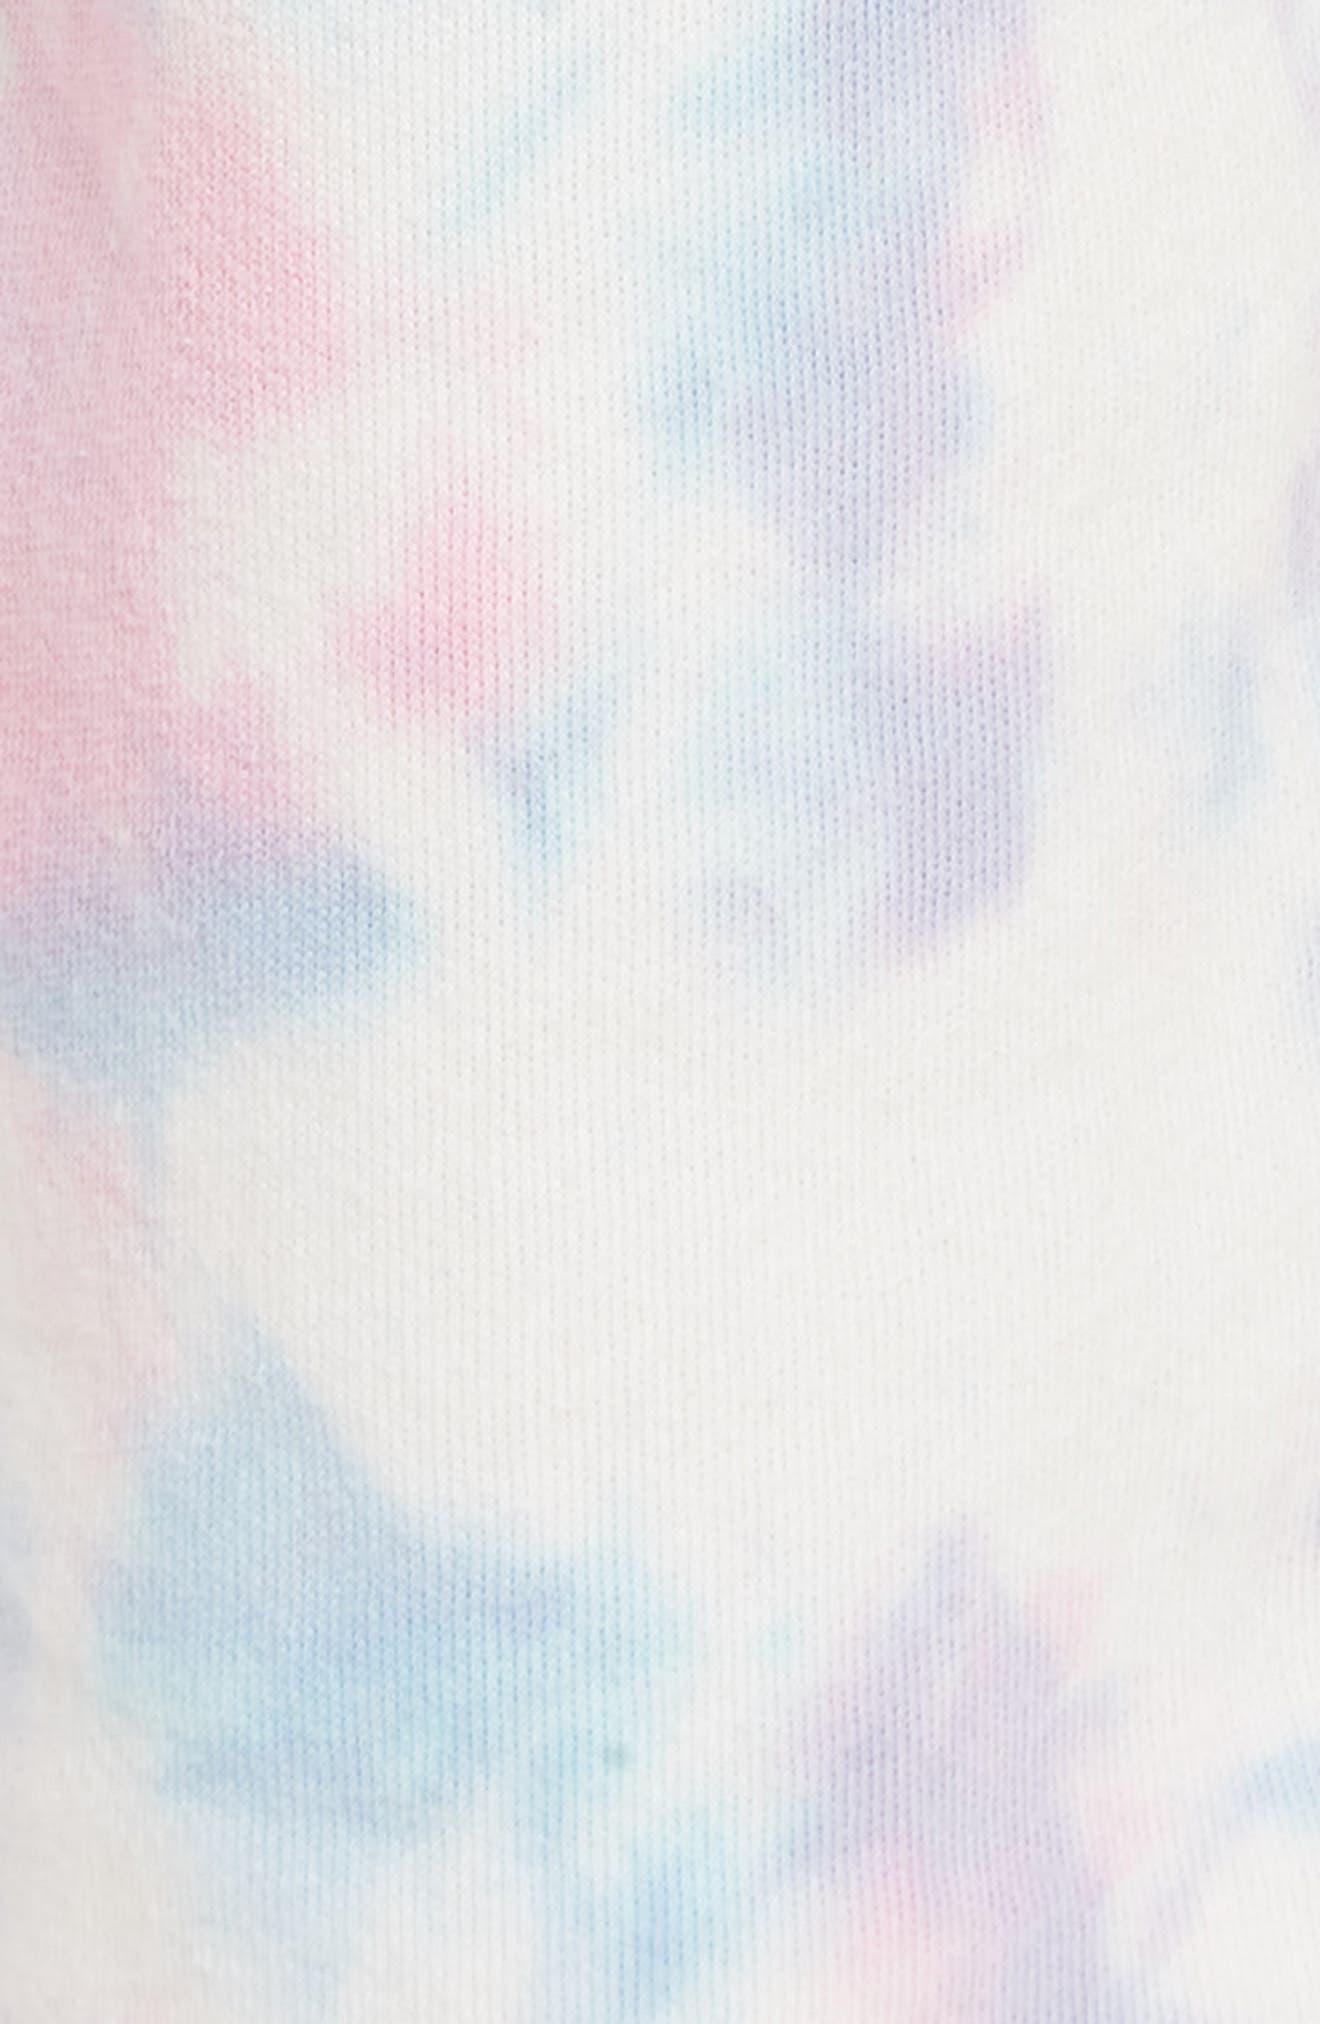 Aura Tie Dye Easy Sweatpants,                             Alternate thumbnail 6, color,                             Aura Tie Dye